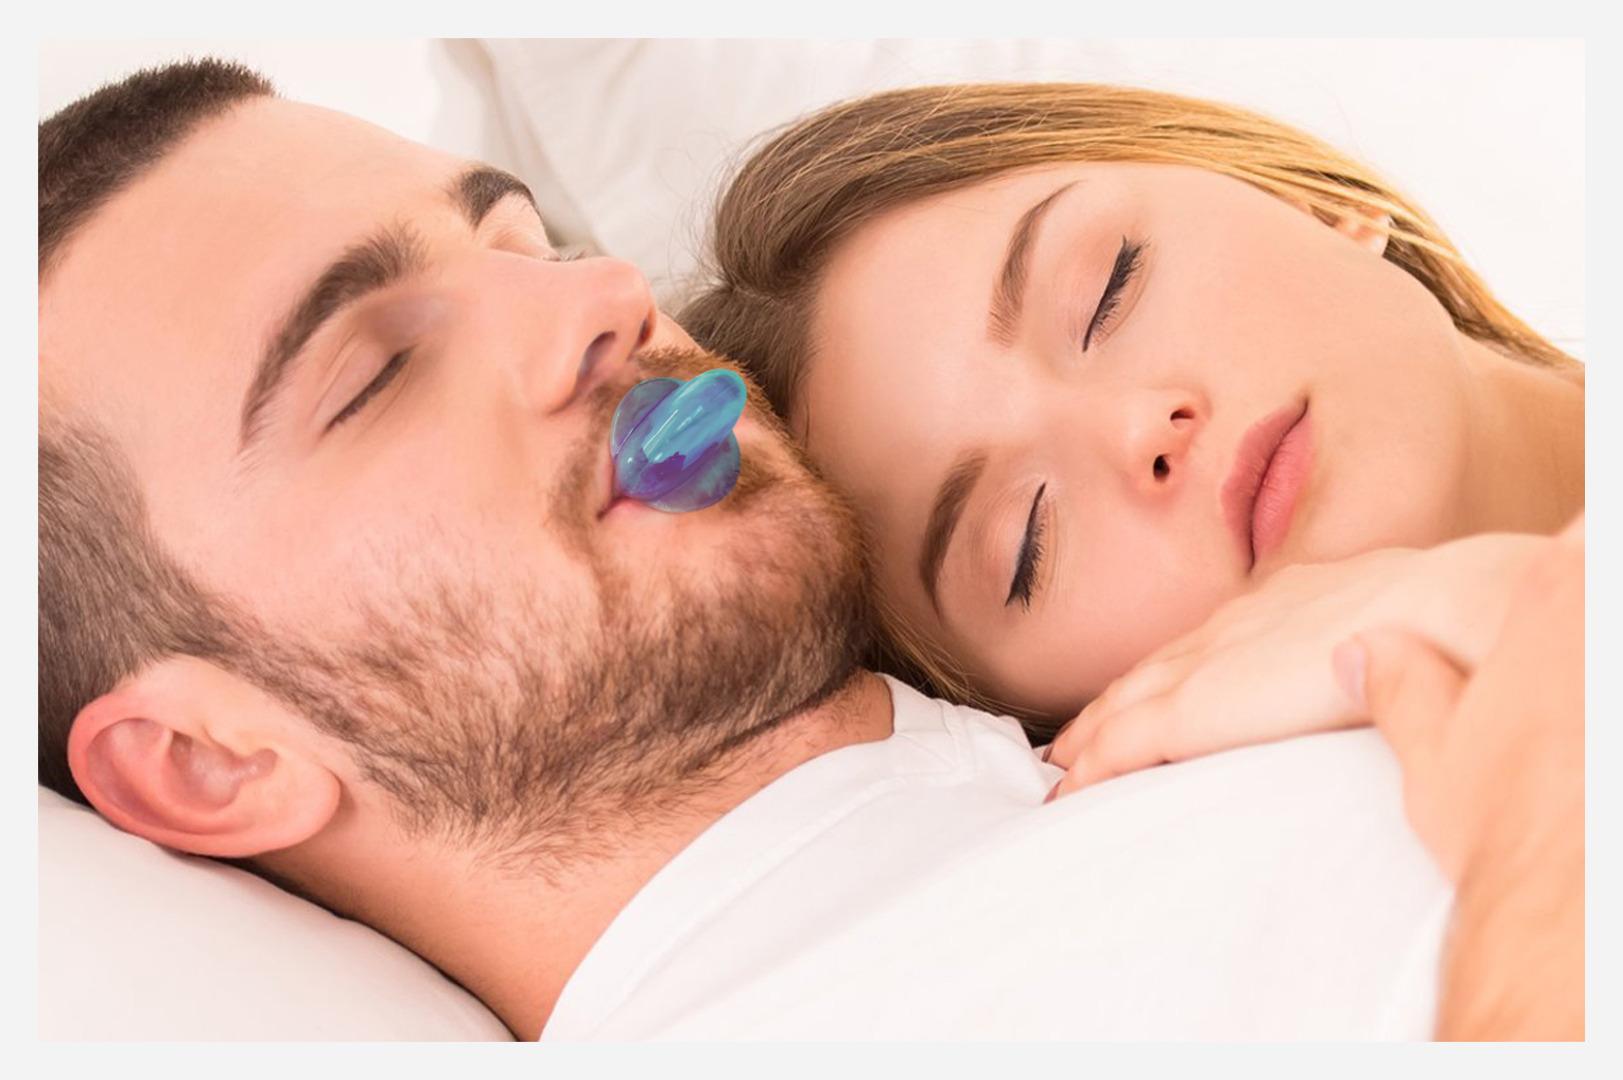 Using tongue restraining device